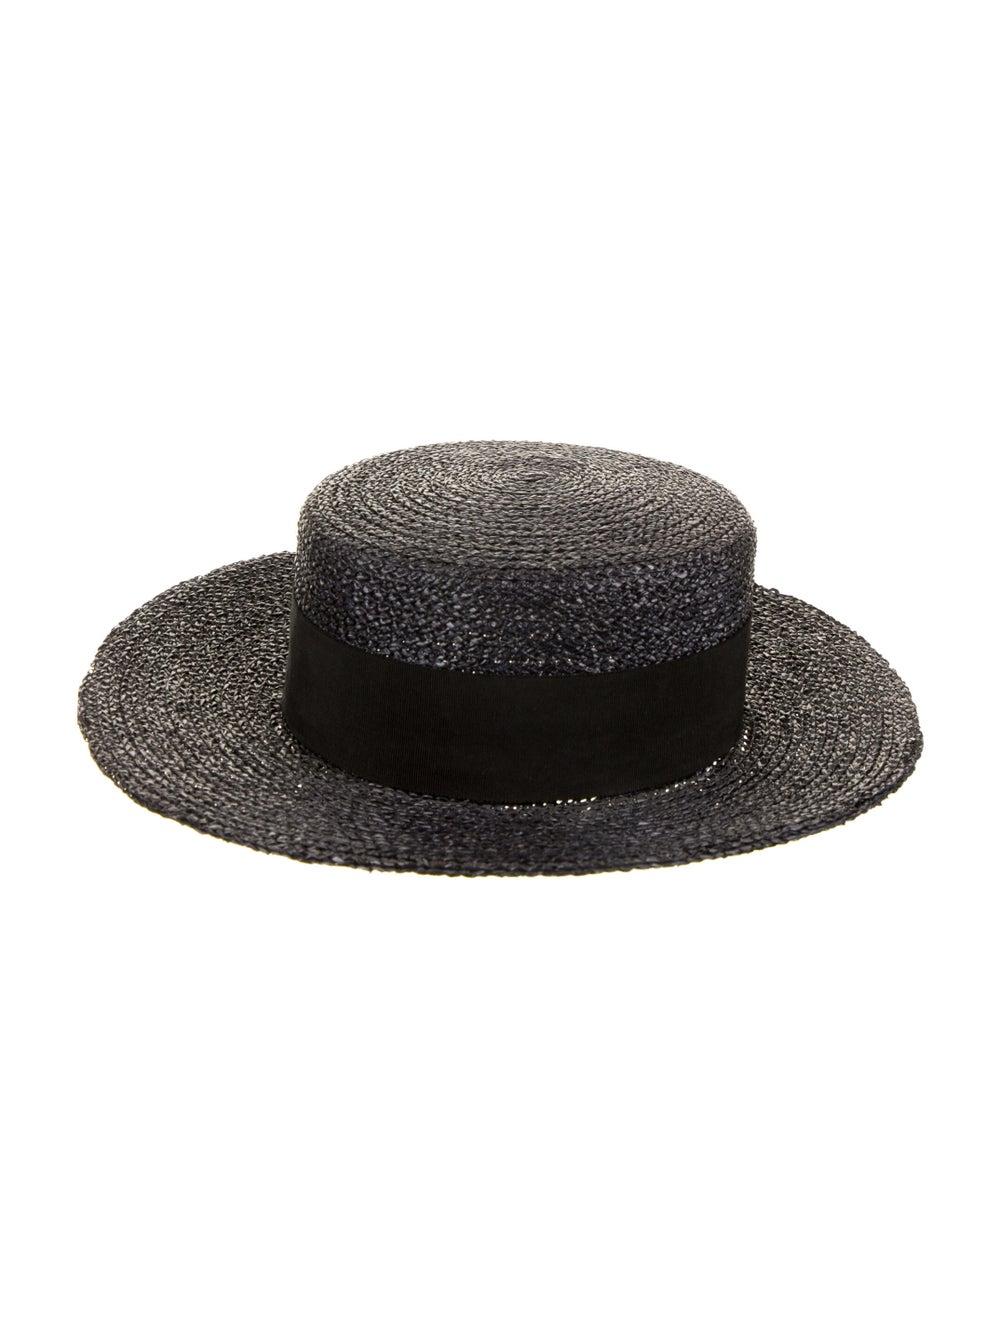 Chanel Straw Wide-Brim Sun Hat Black - image 1